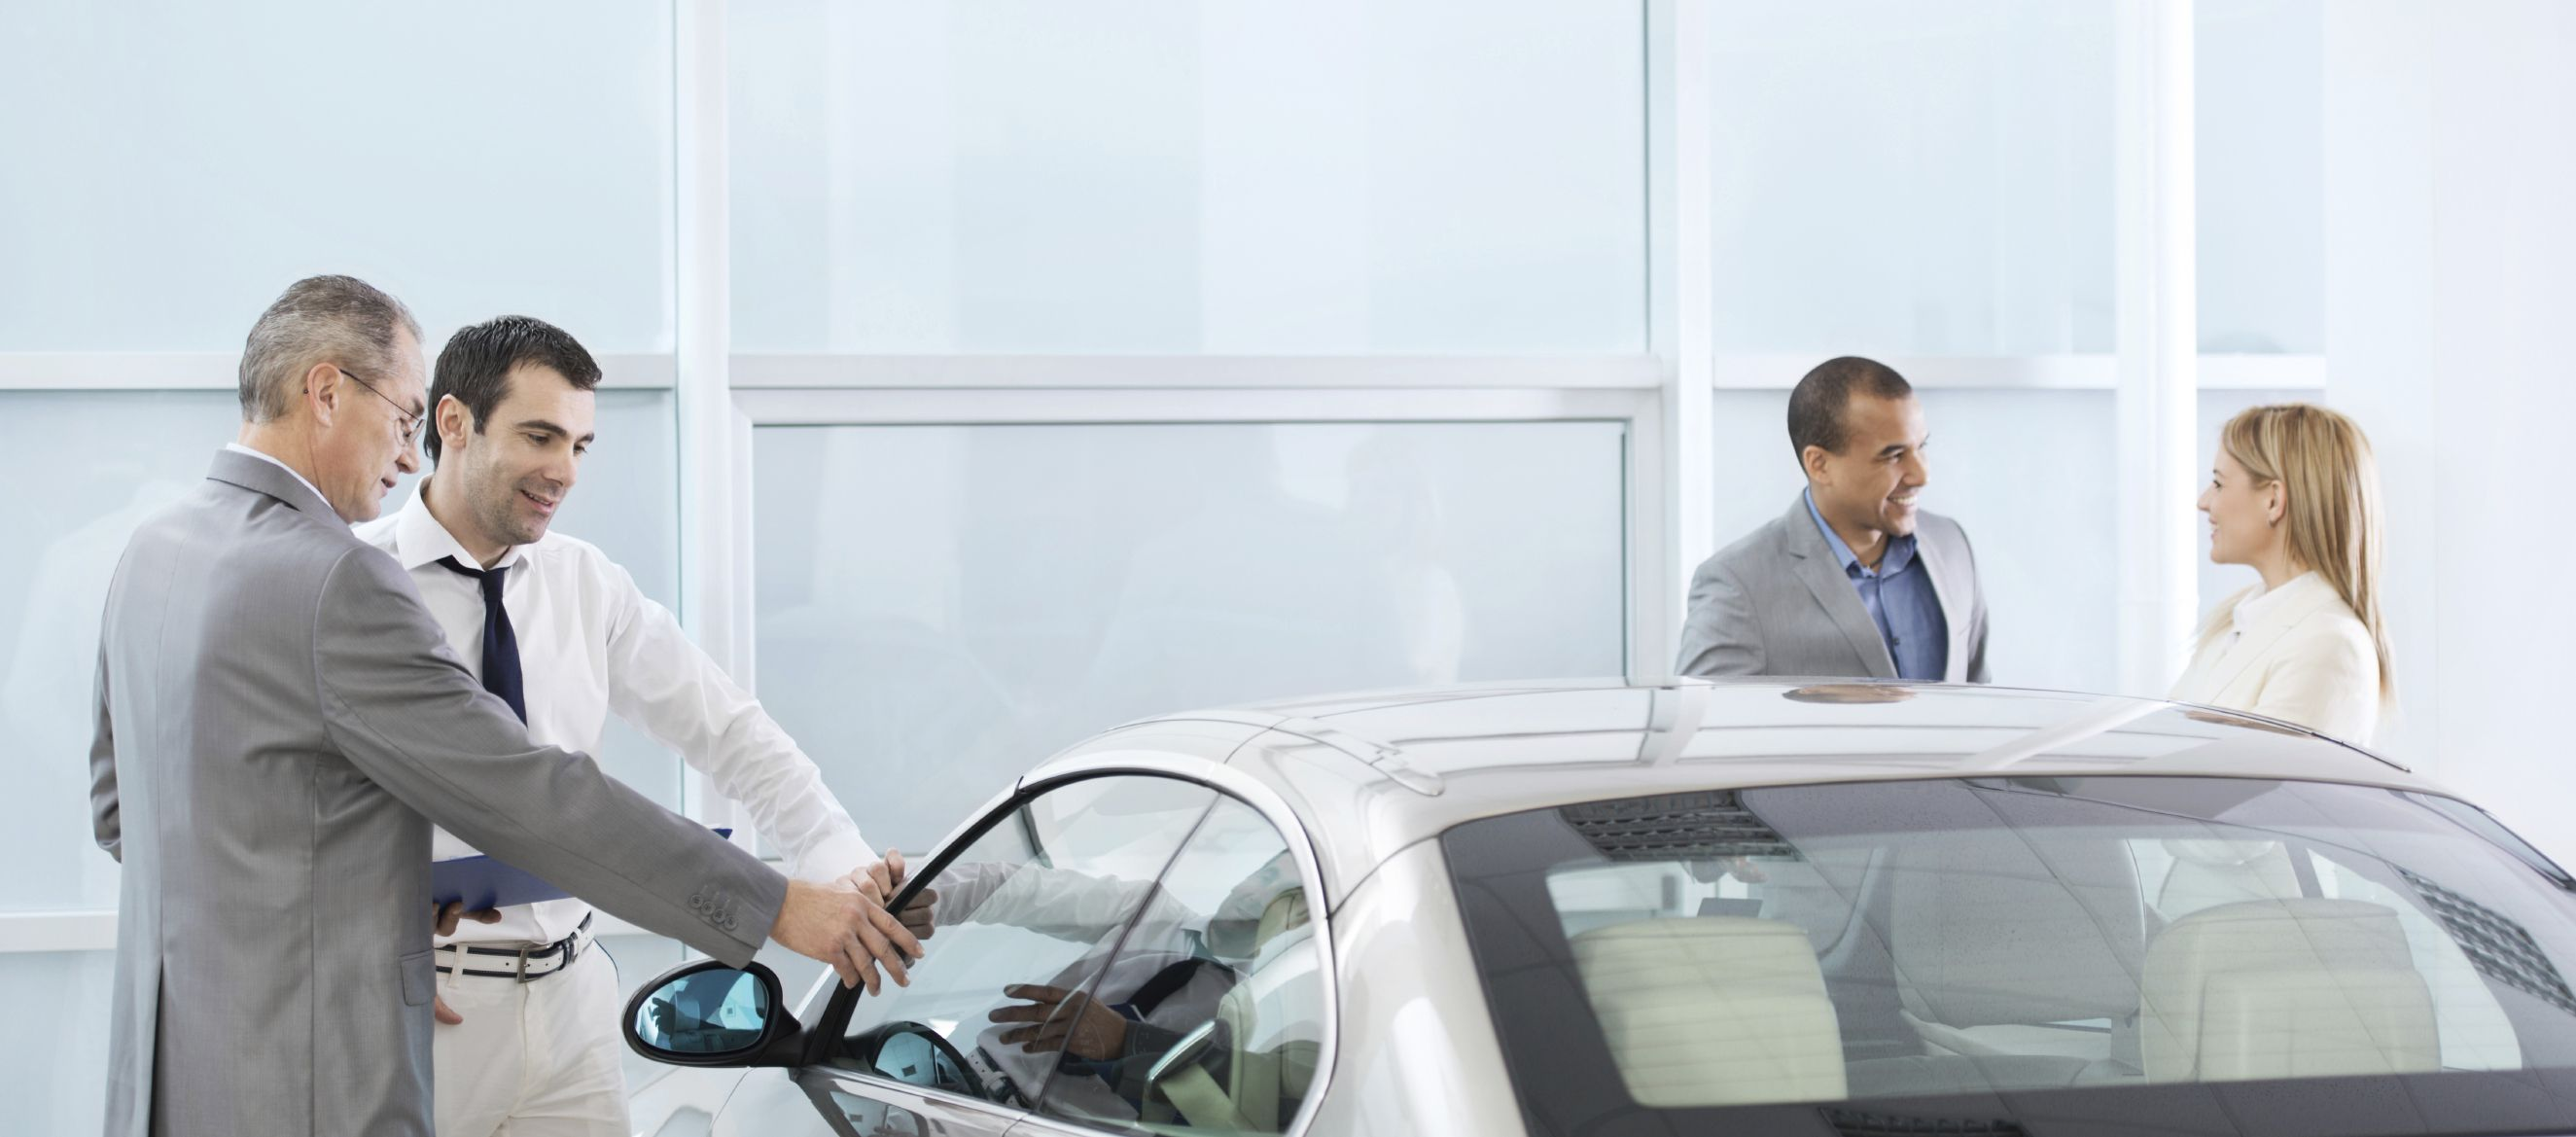 Save $325 on Processing Fees at Pohanka Hyundai of Capitol Heights near Alexandria, VA